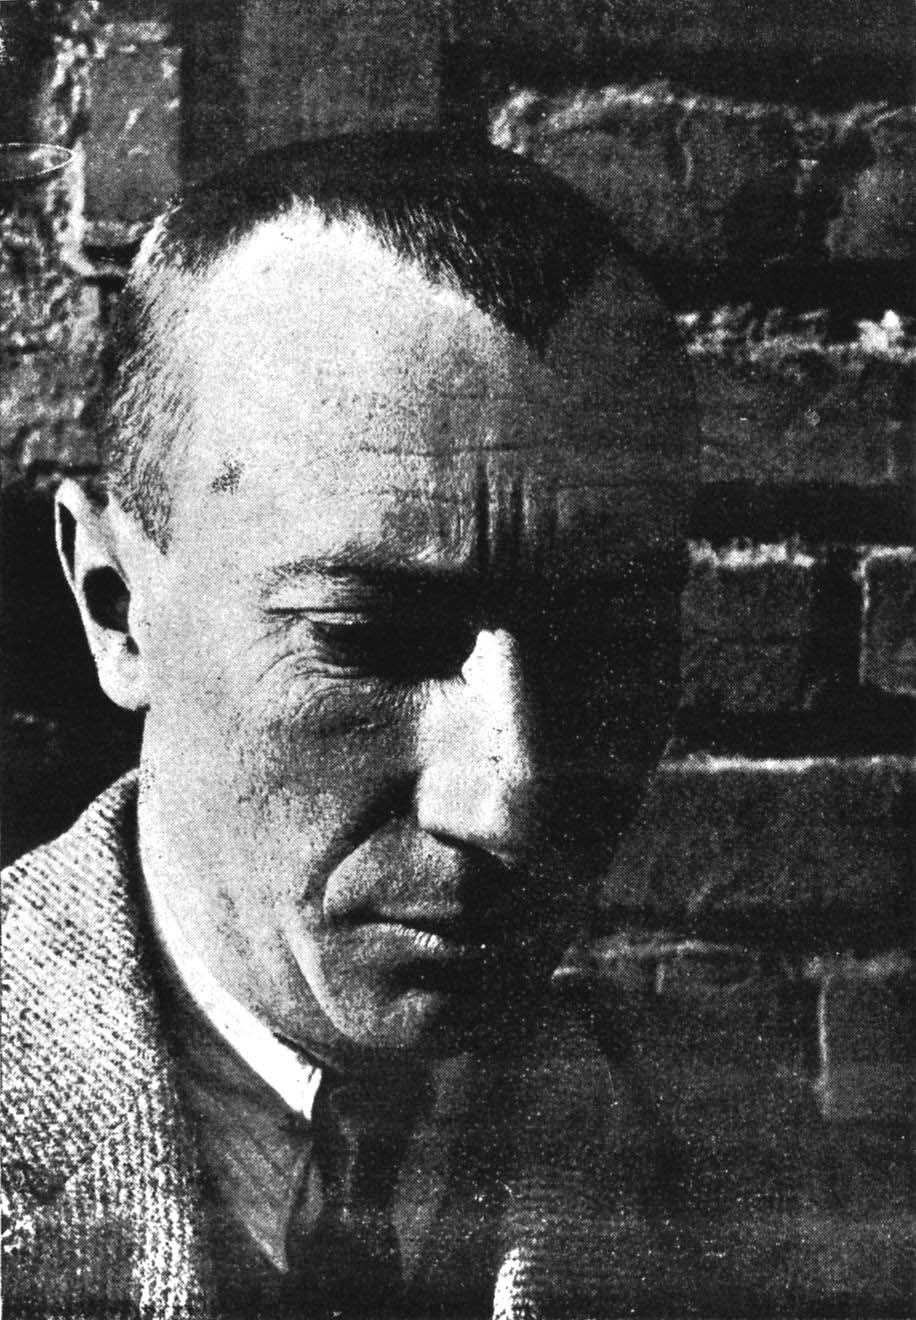 Portre of Arp, Hans